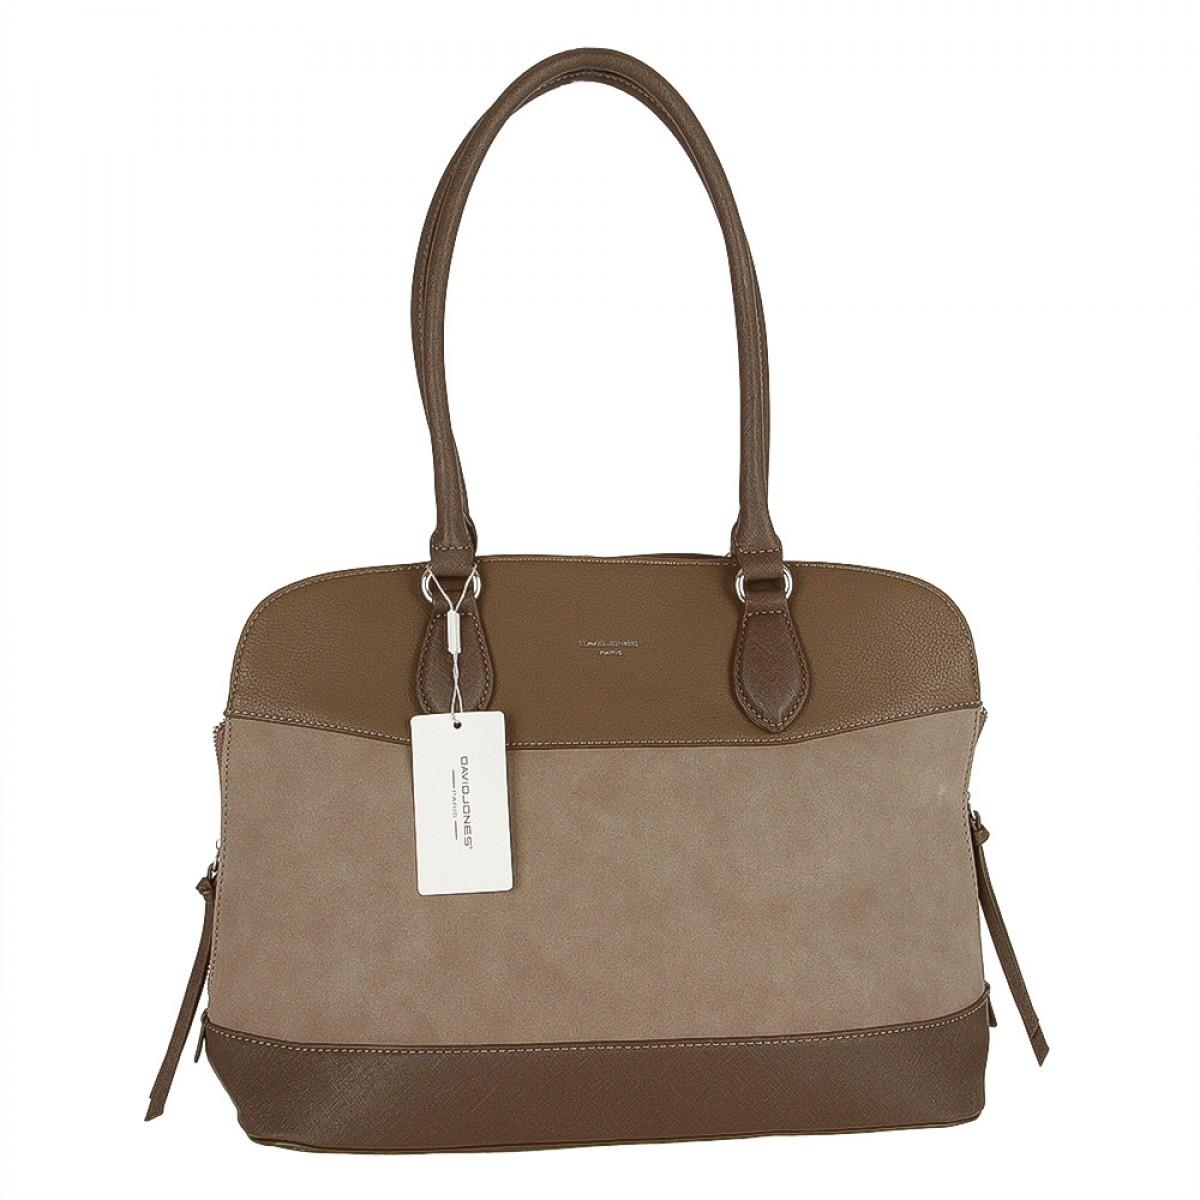 Жіноча сумка David Jones 5616-2 D.CAMEL